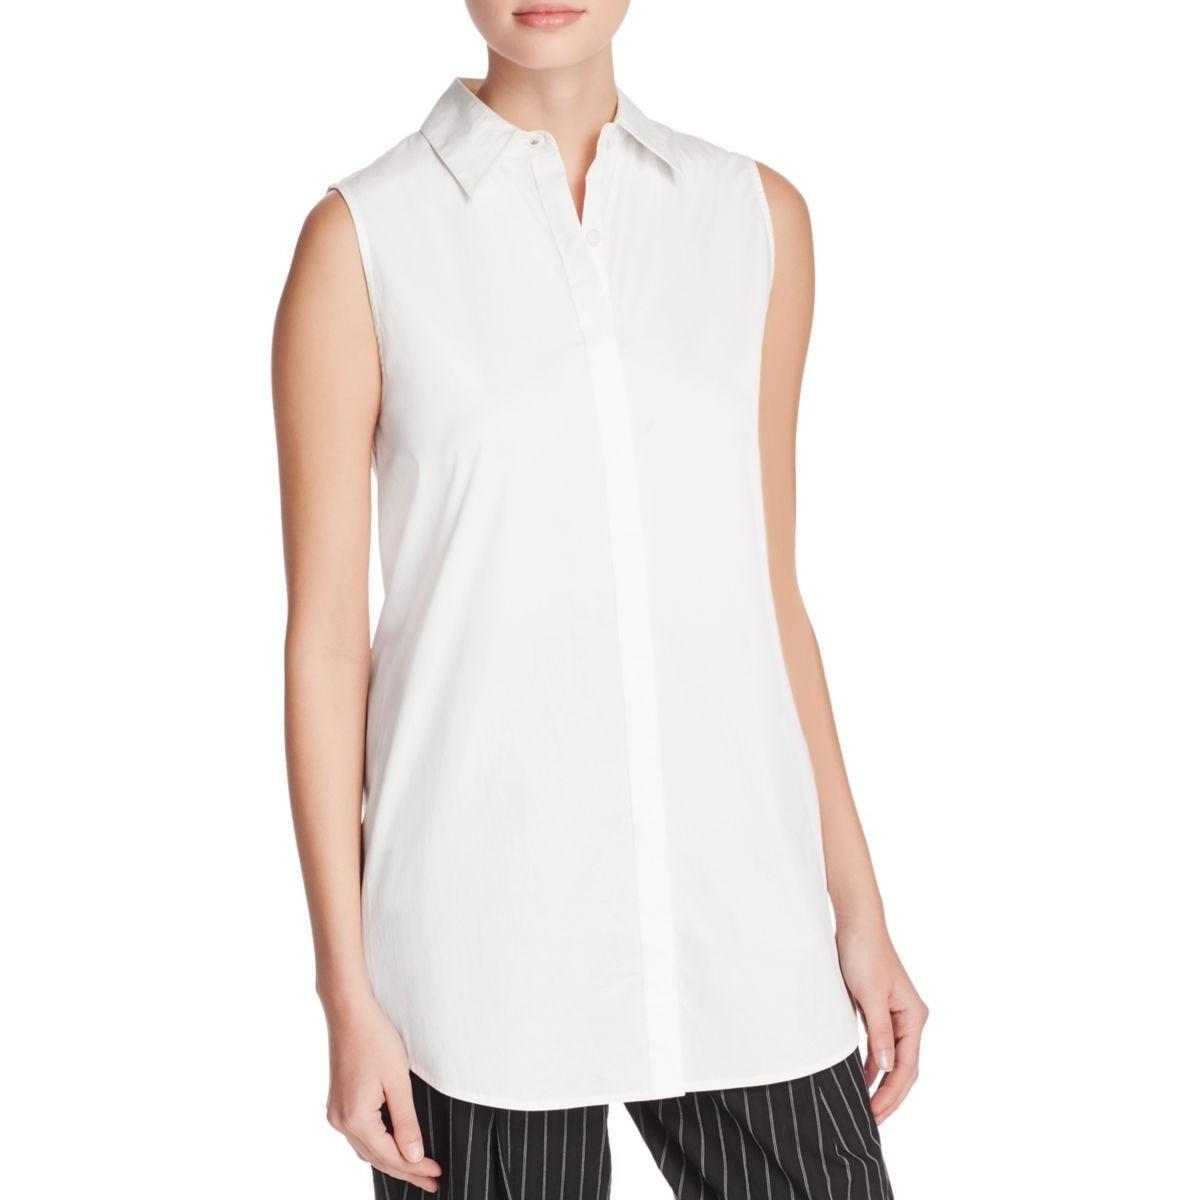 DKNY Womens Split Back Sleeveless Button-Down Top White L by DKNY